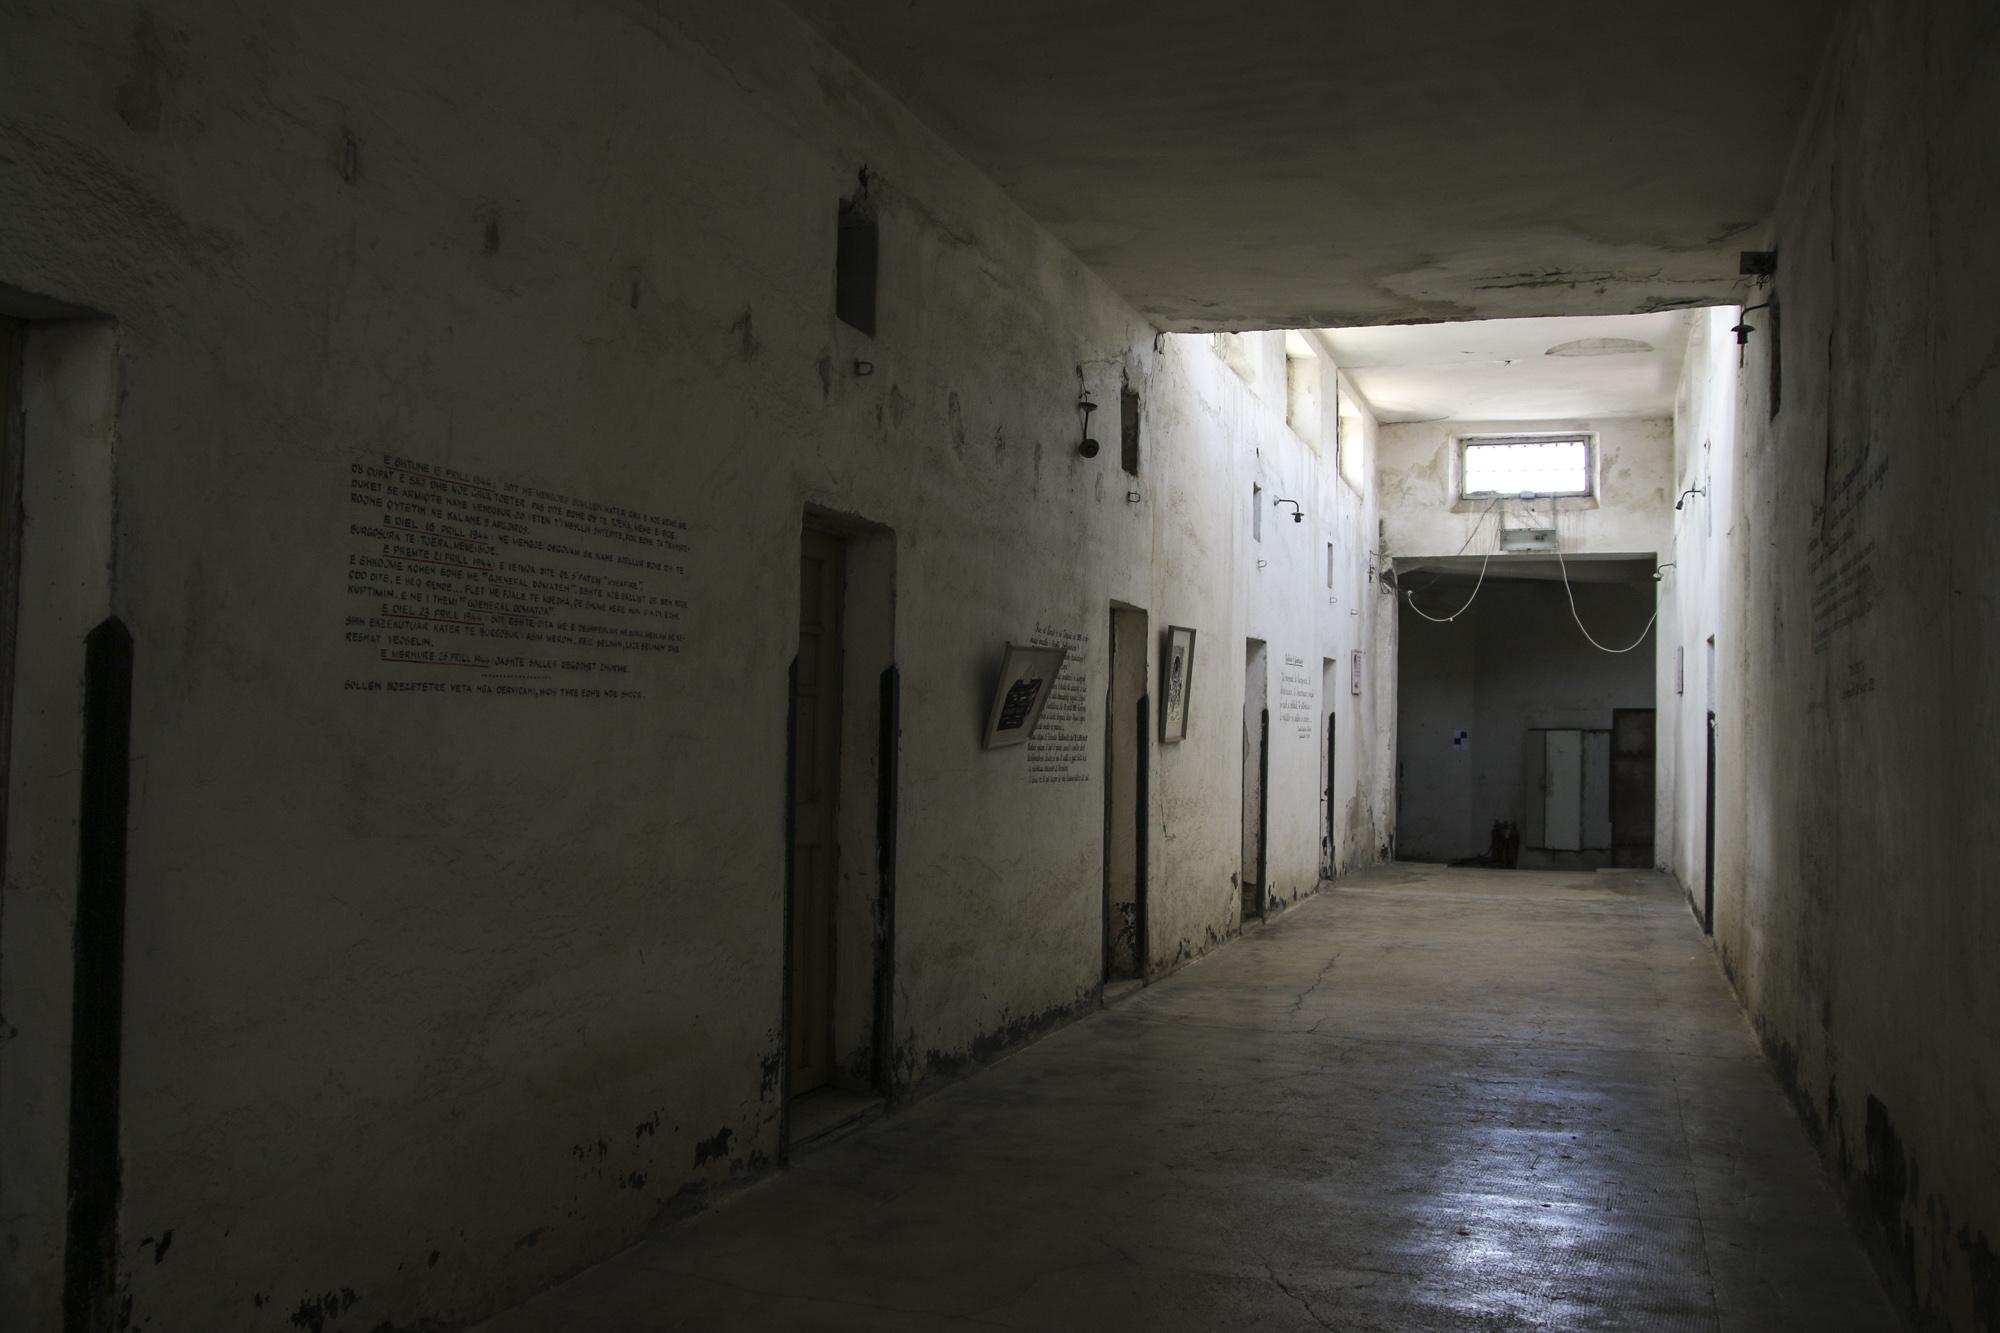 gjirokastra prison museum